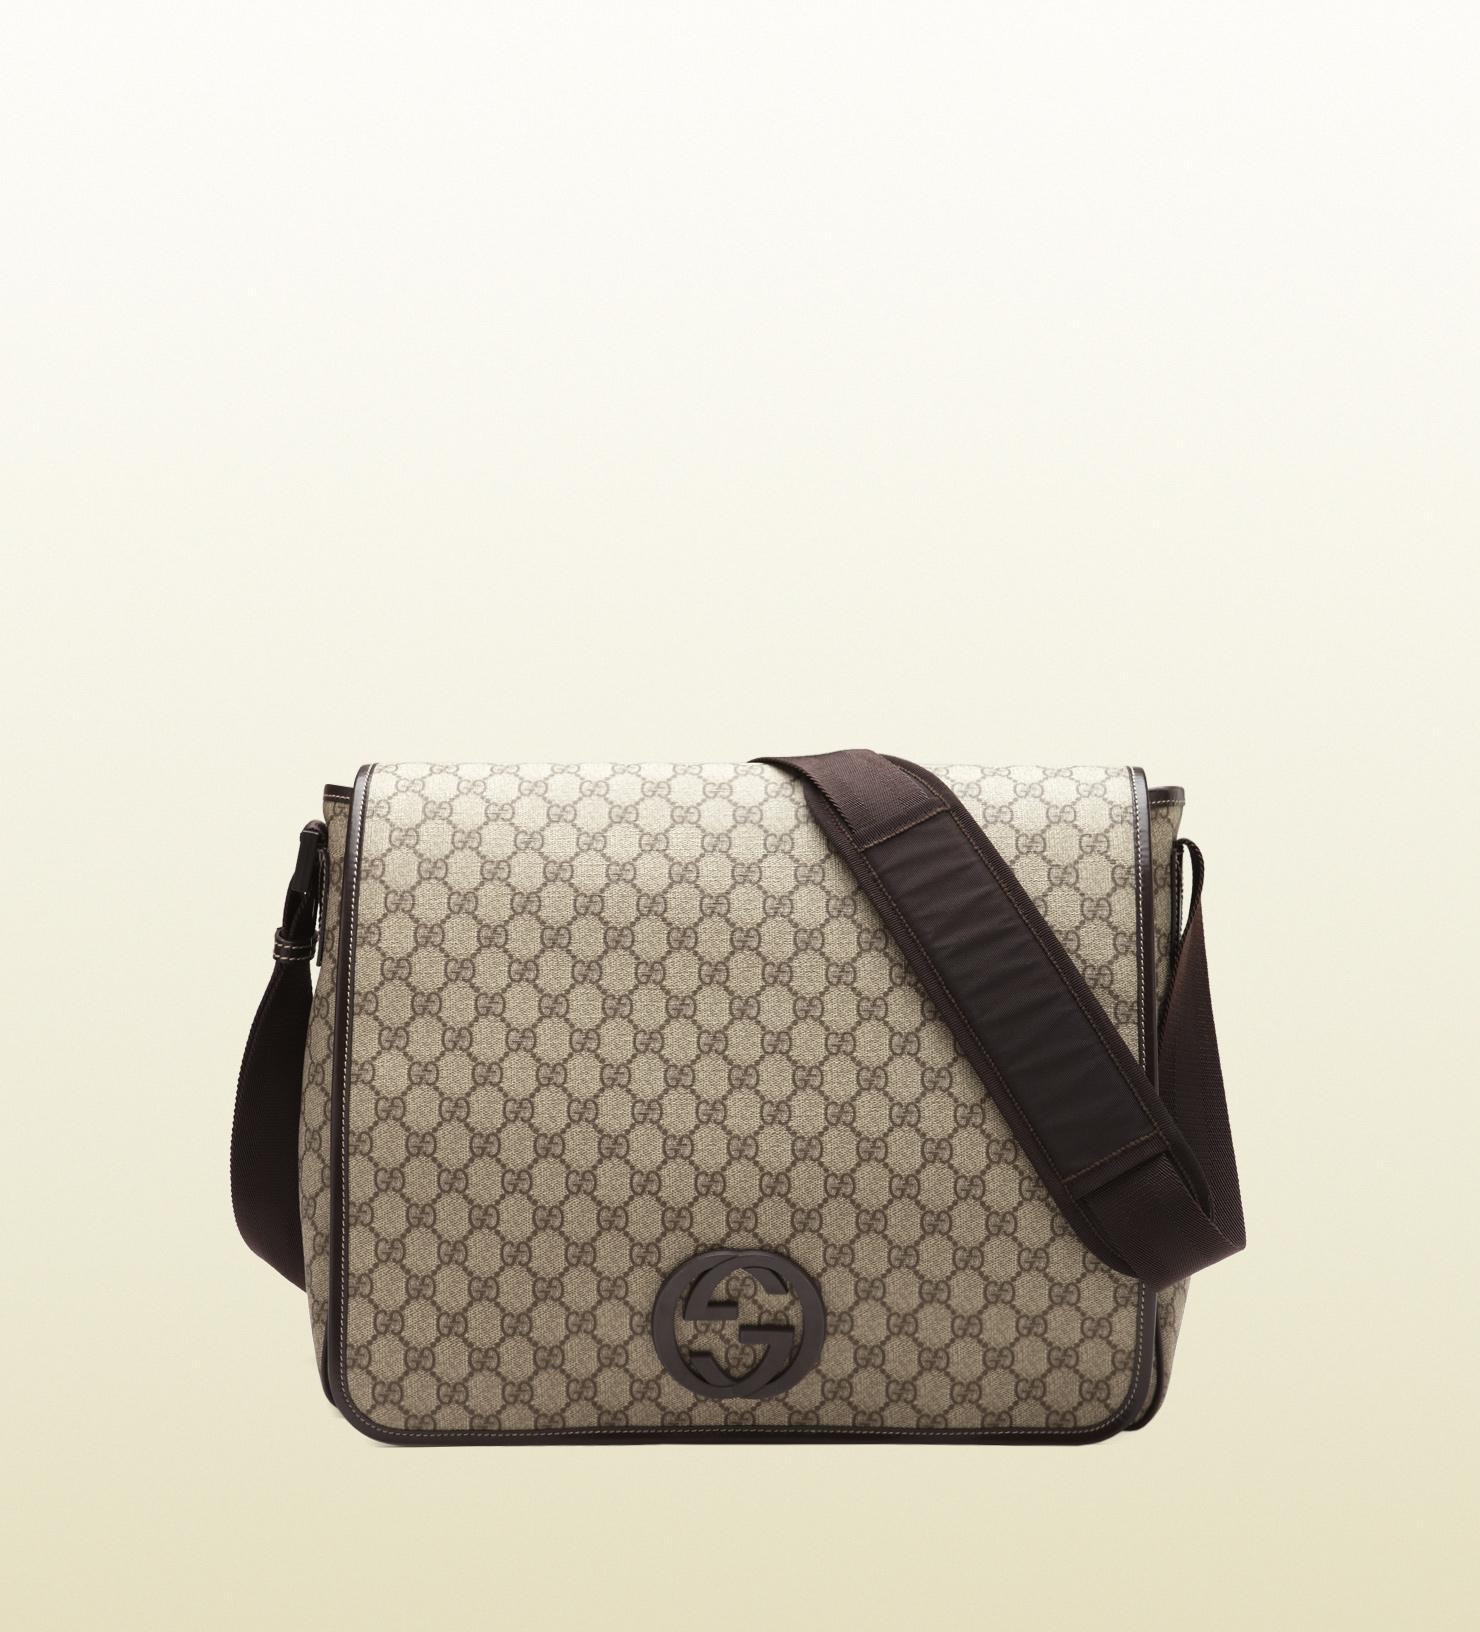 c5d60c571b0757 Gucci Gg Supreme Messenger Bag Mens | Stanford Center for ...